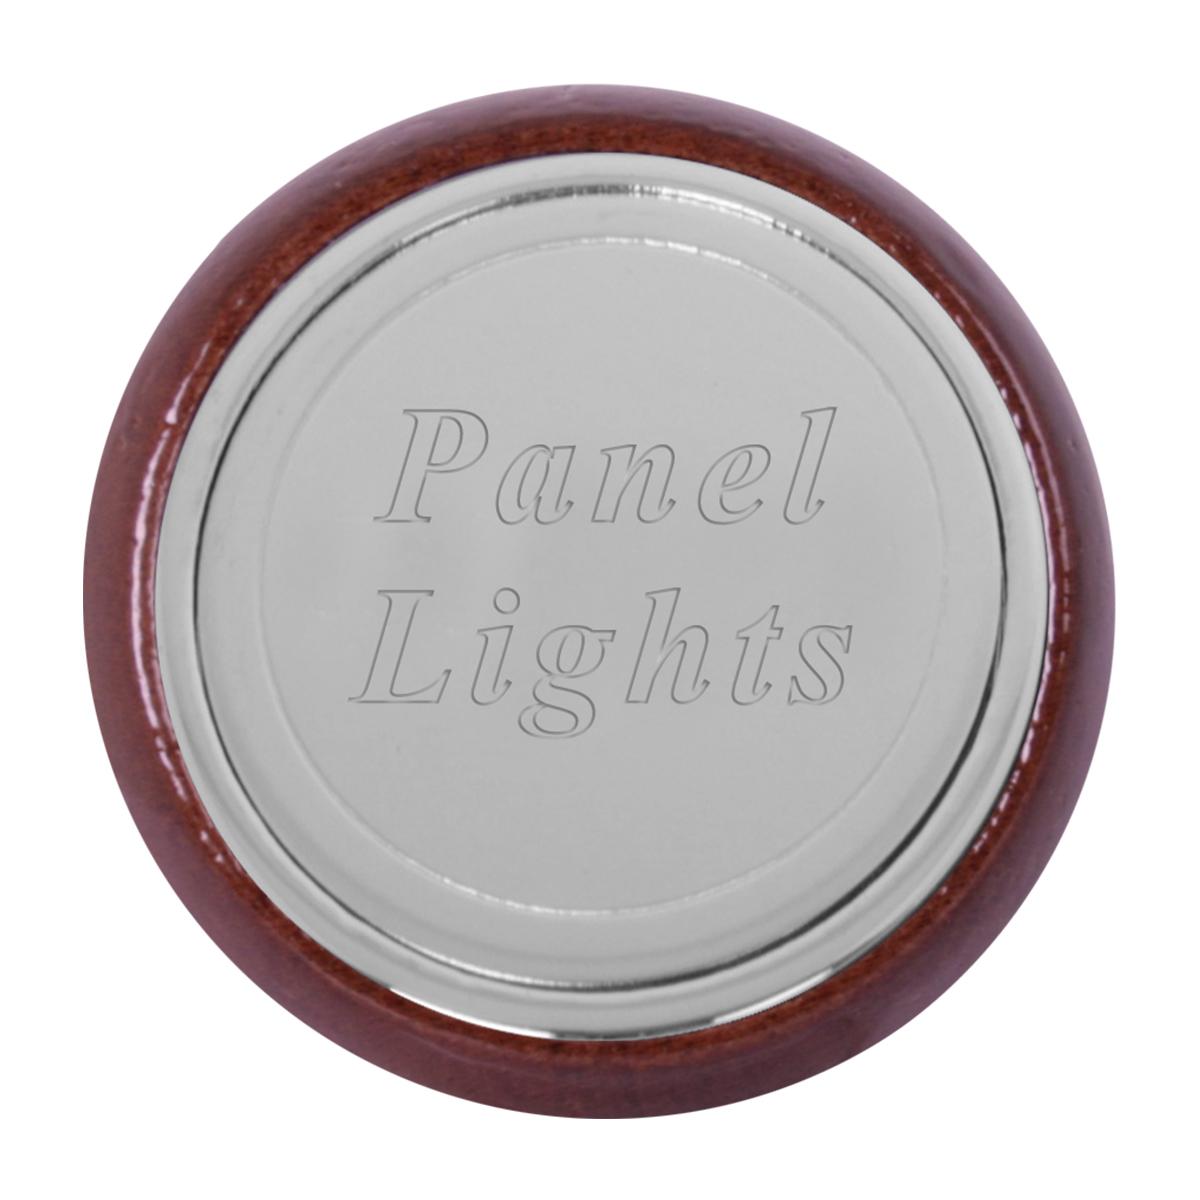 96031 Dashboard Control Knob w/ Panel Light Script